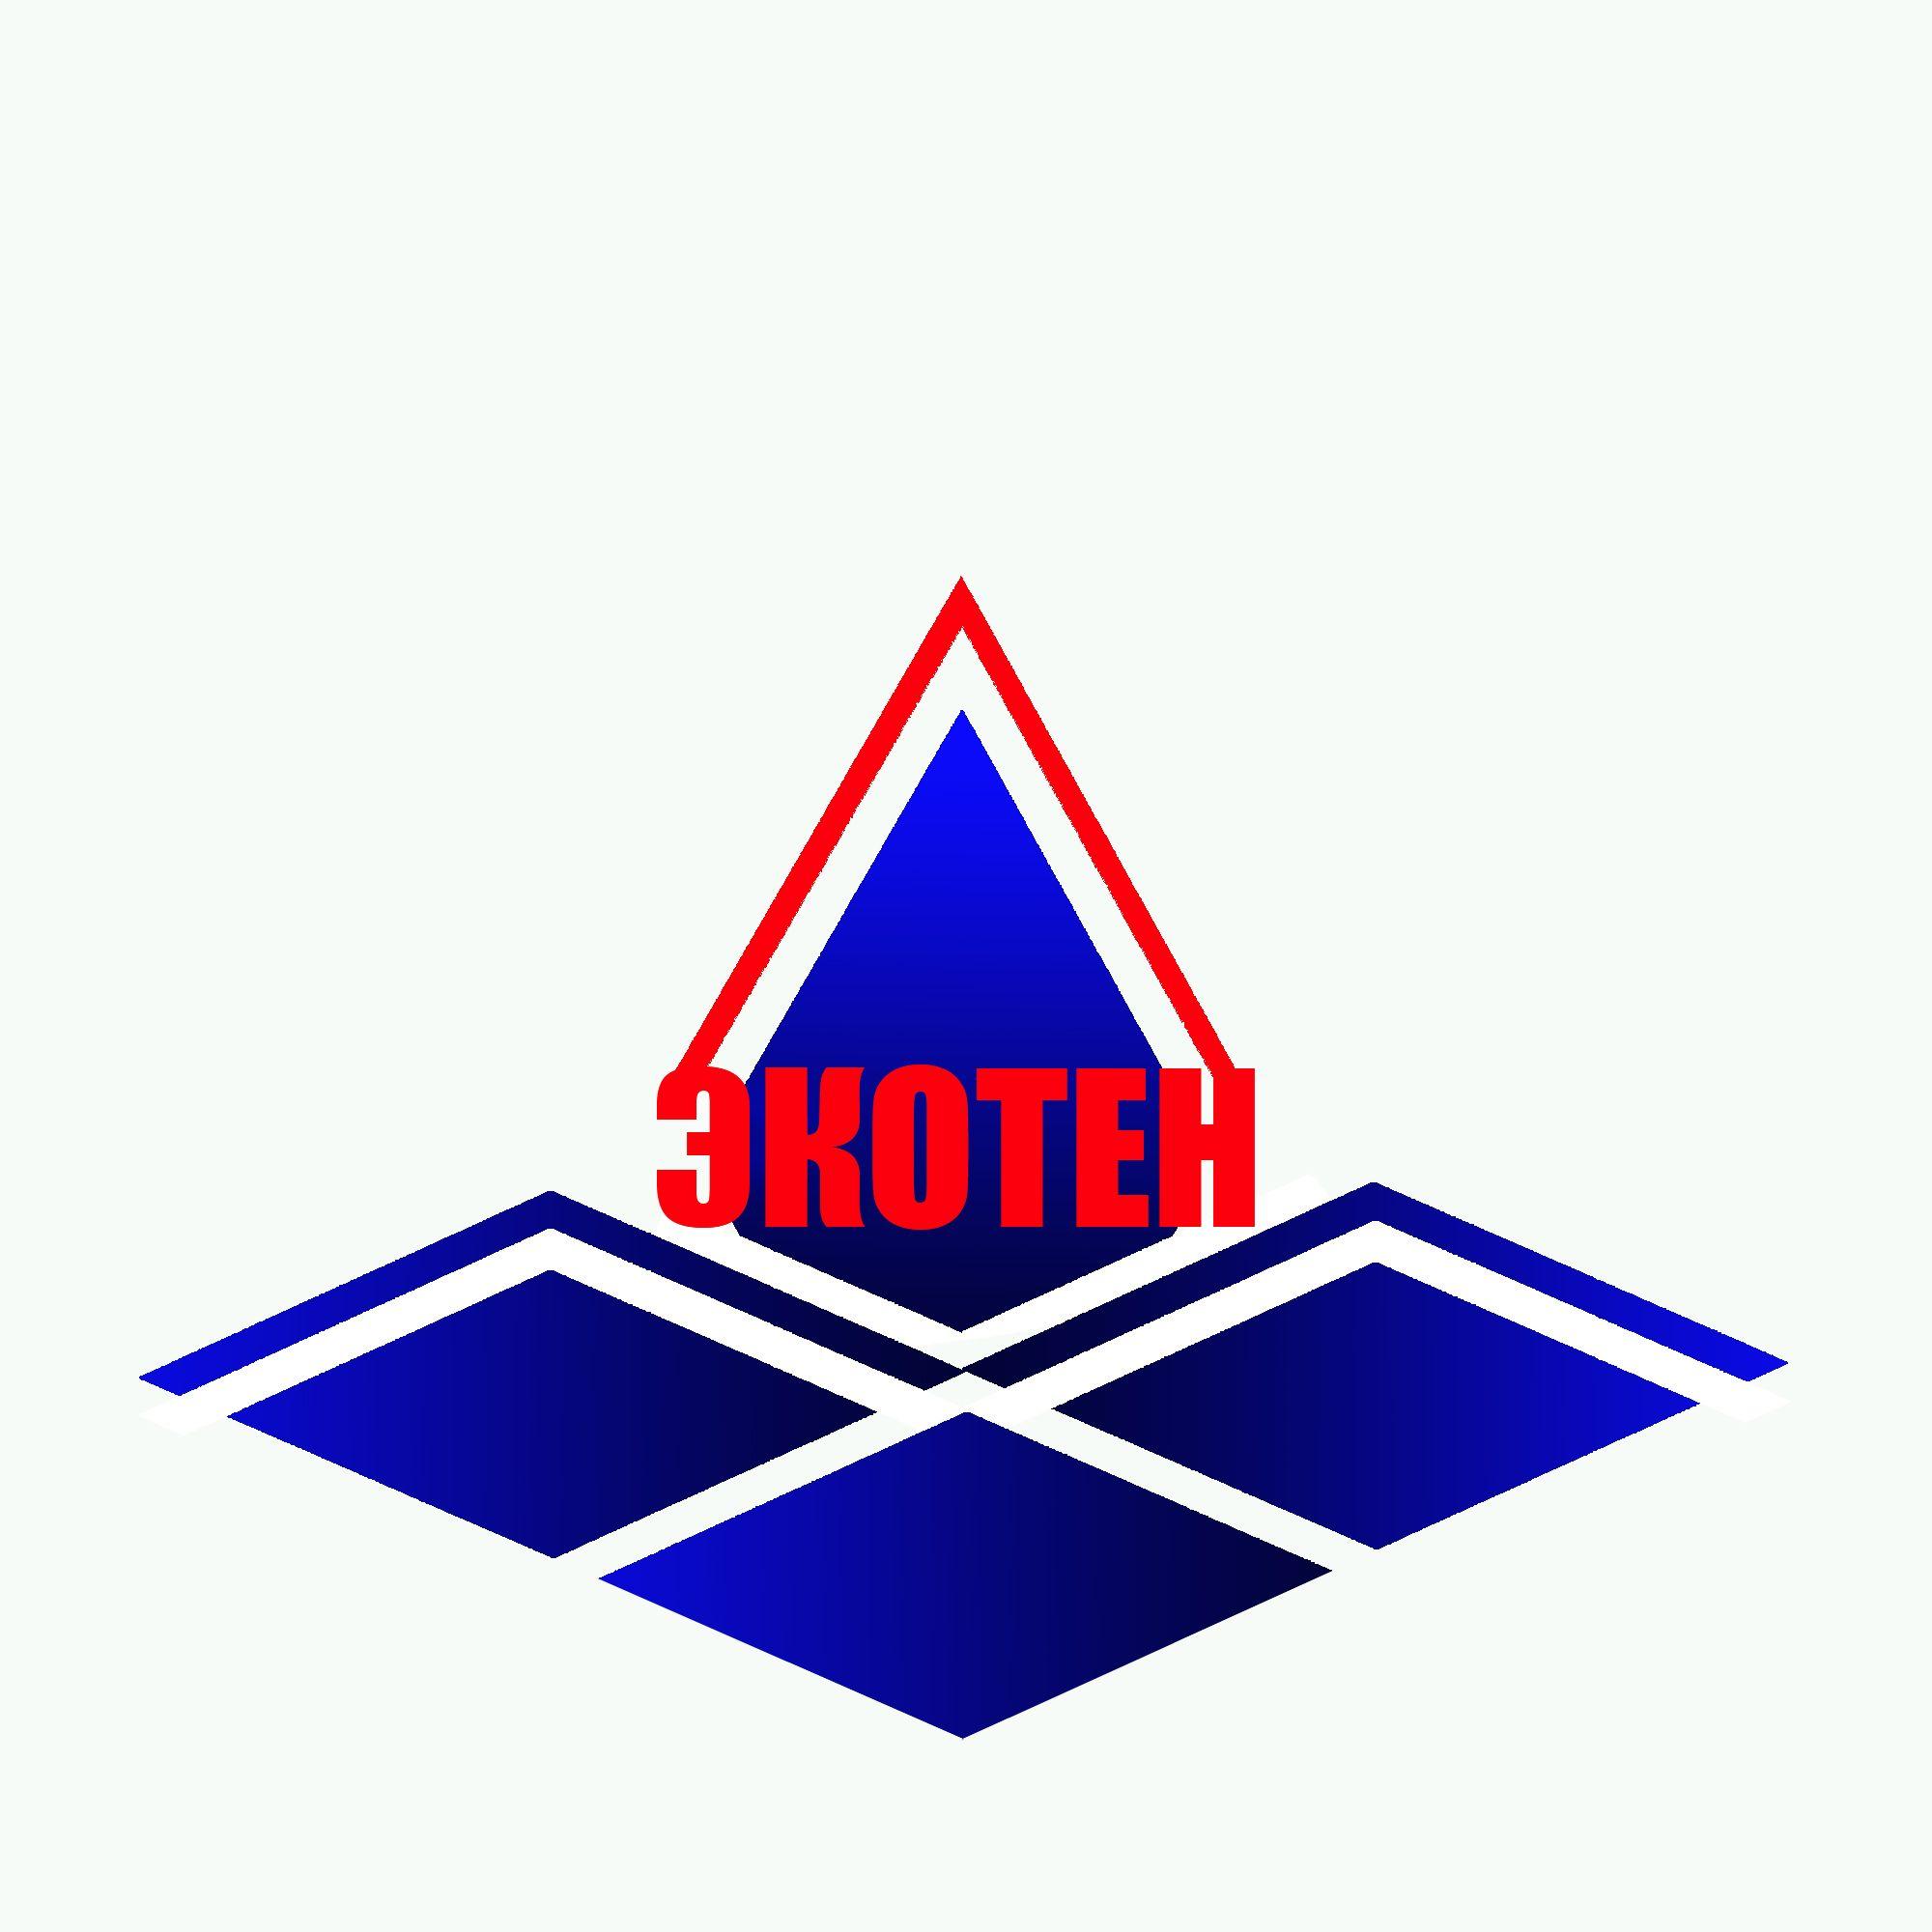 Логотип для научно - технического концерна - дизайнер Velo16